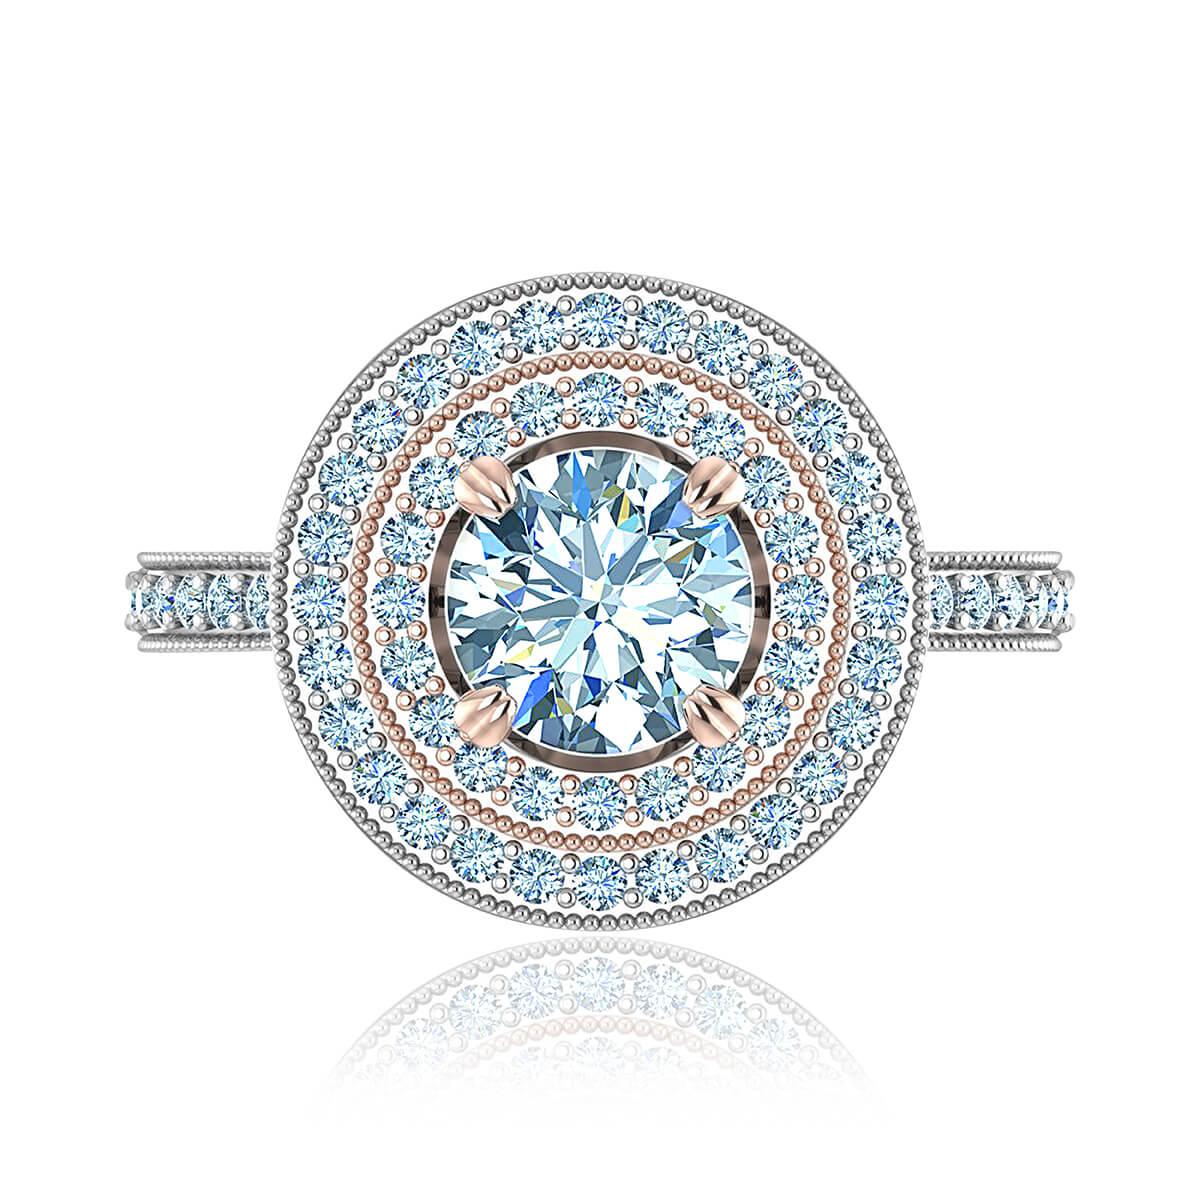 Mallow Diamond Ring